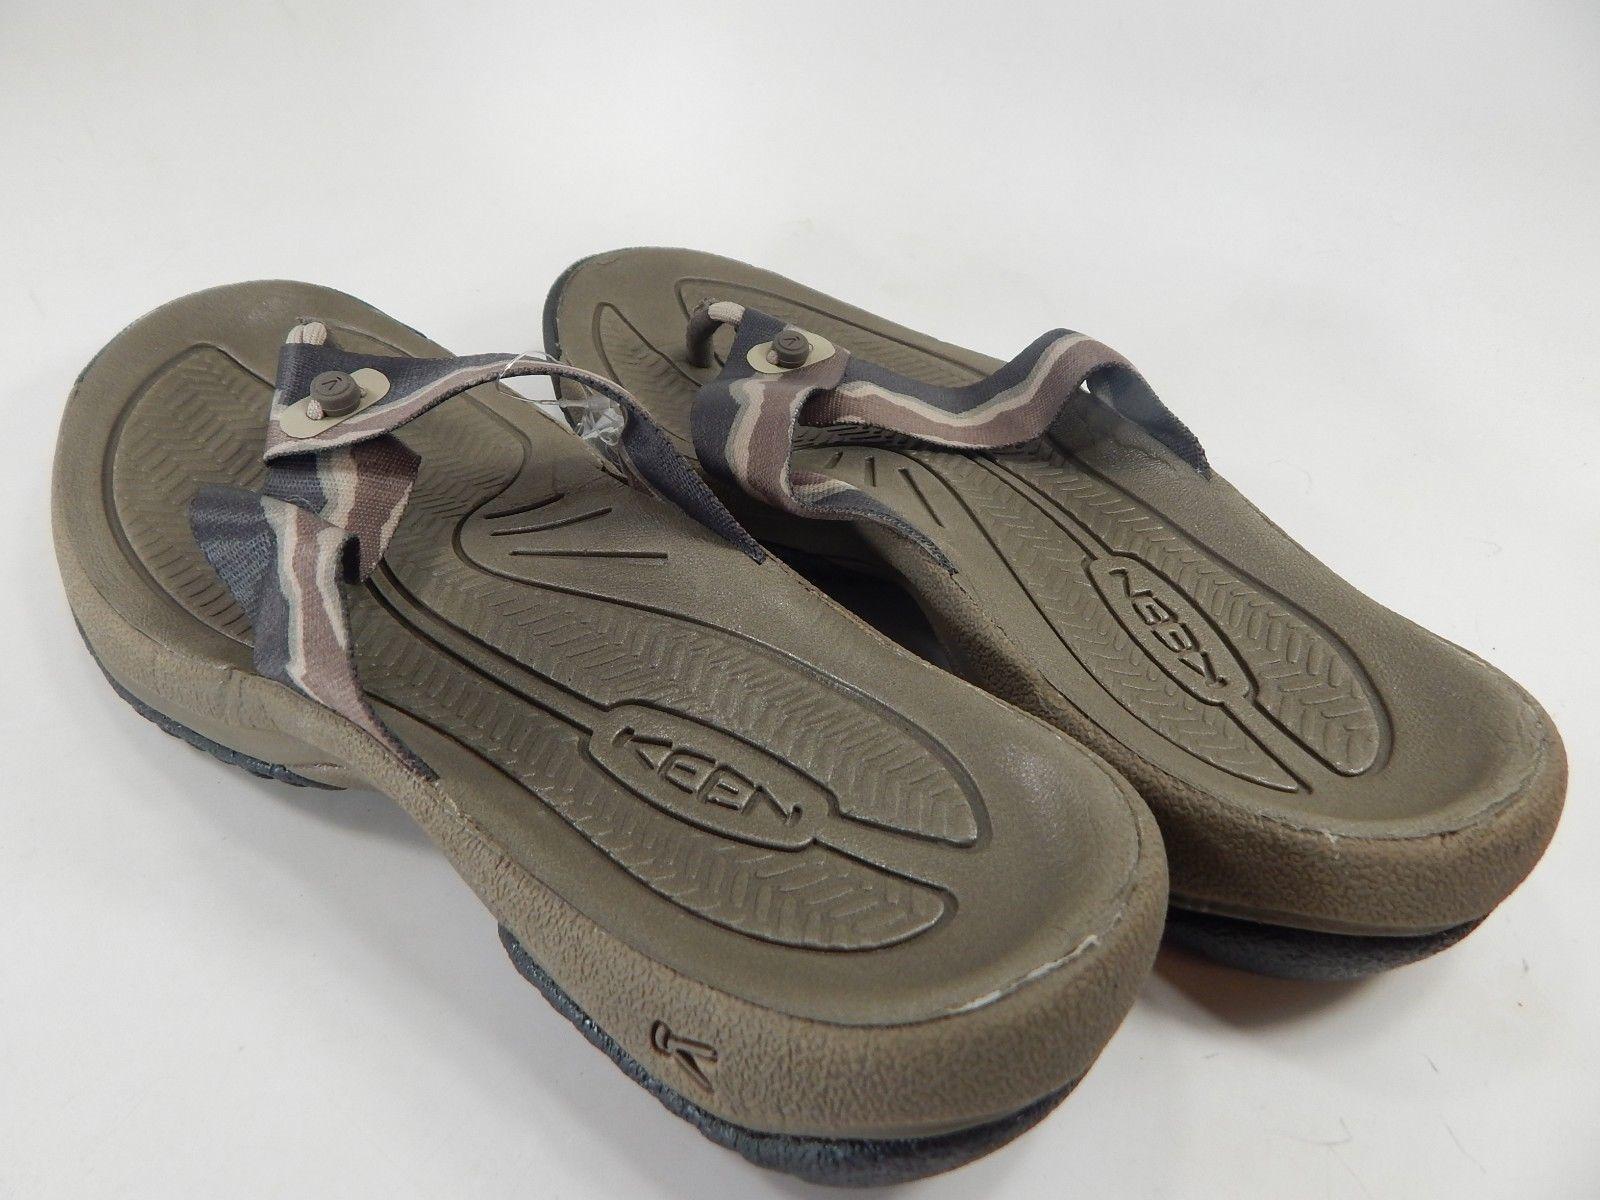 Keen Kona Flip Flop Slip On Sandals Men's Size 9 M (D) EU 42 Bungee Cord / Raven